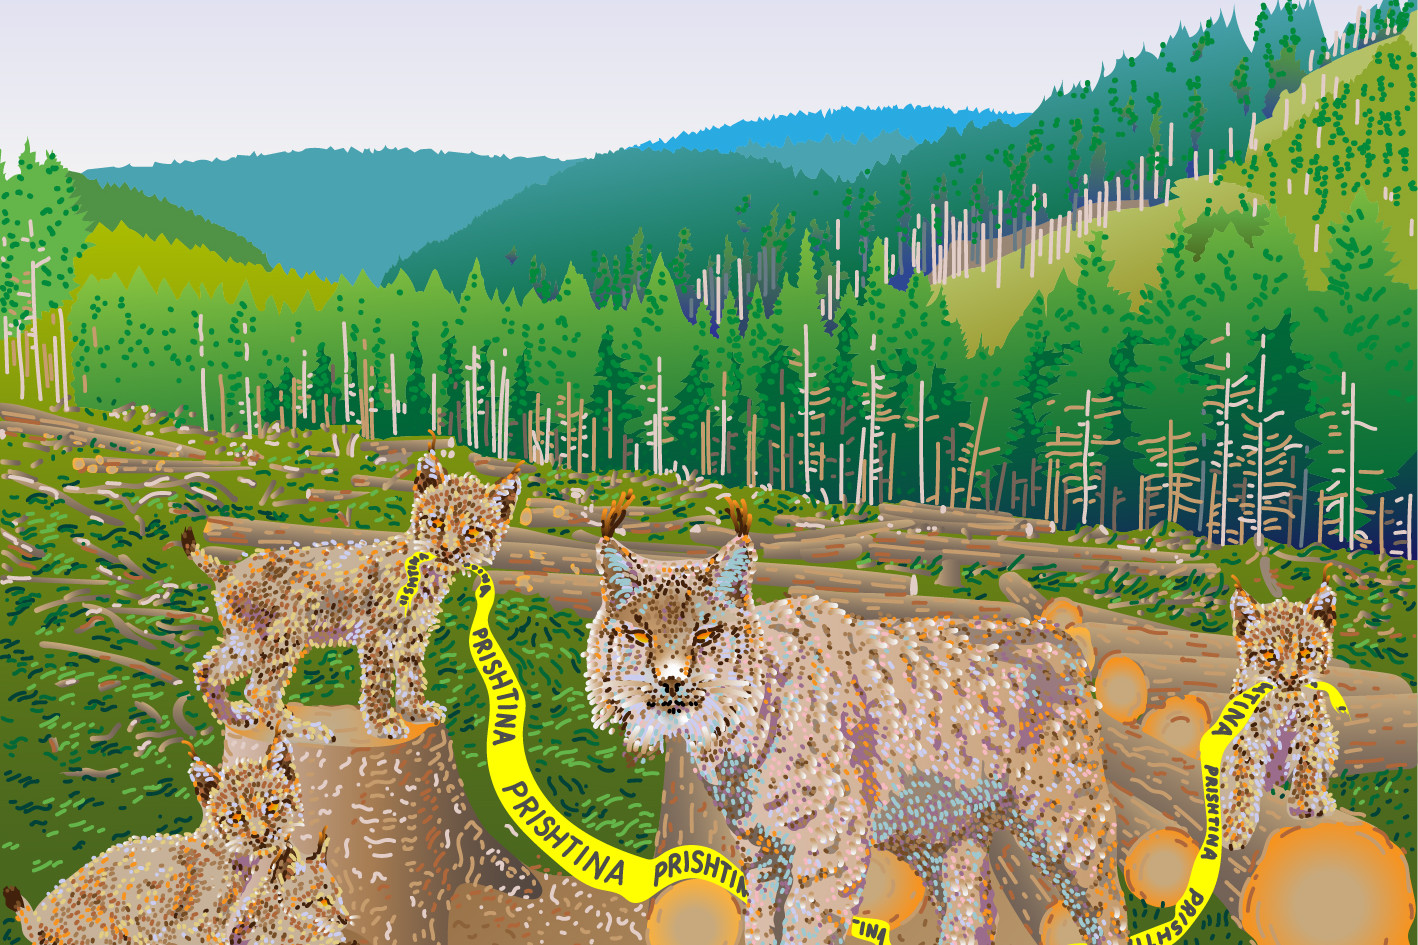 Deforest lynxs